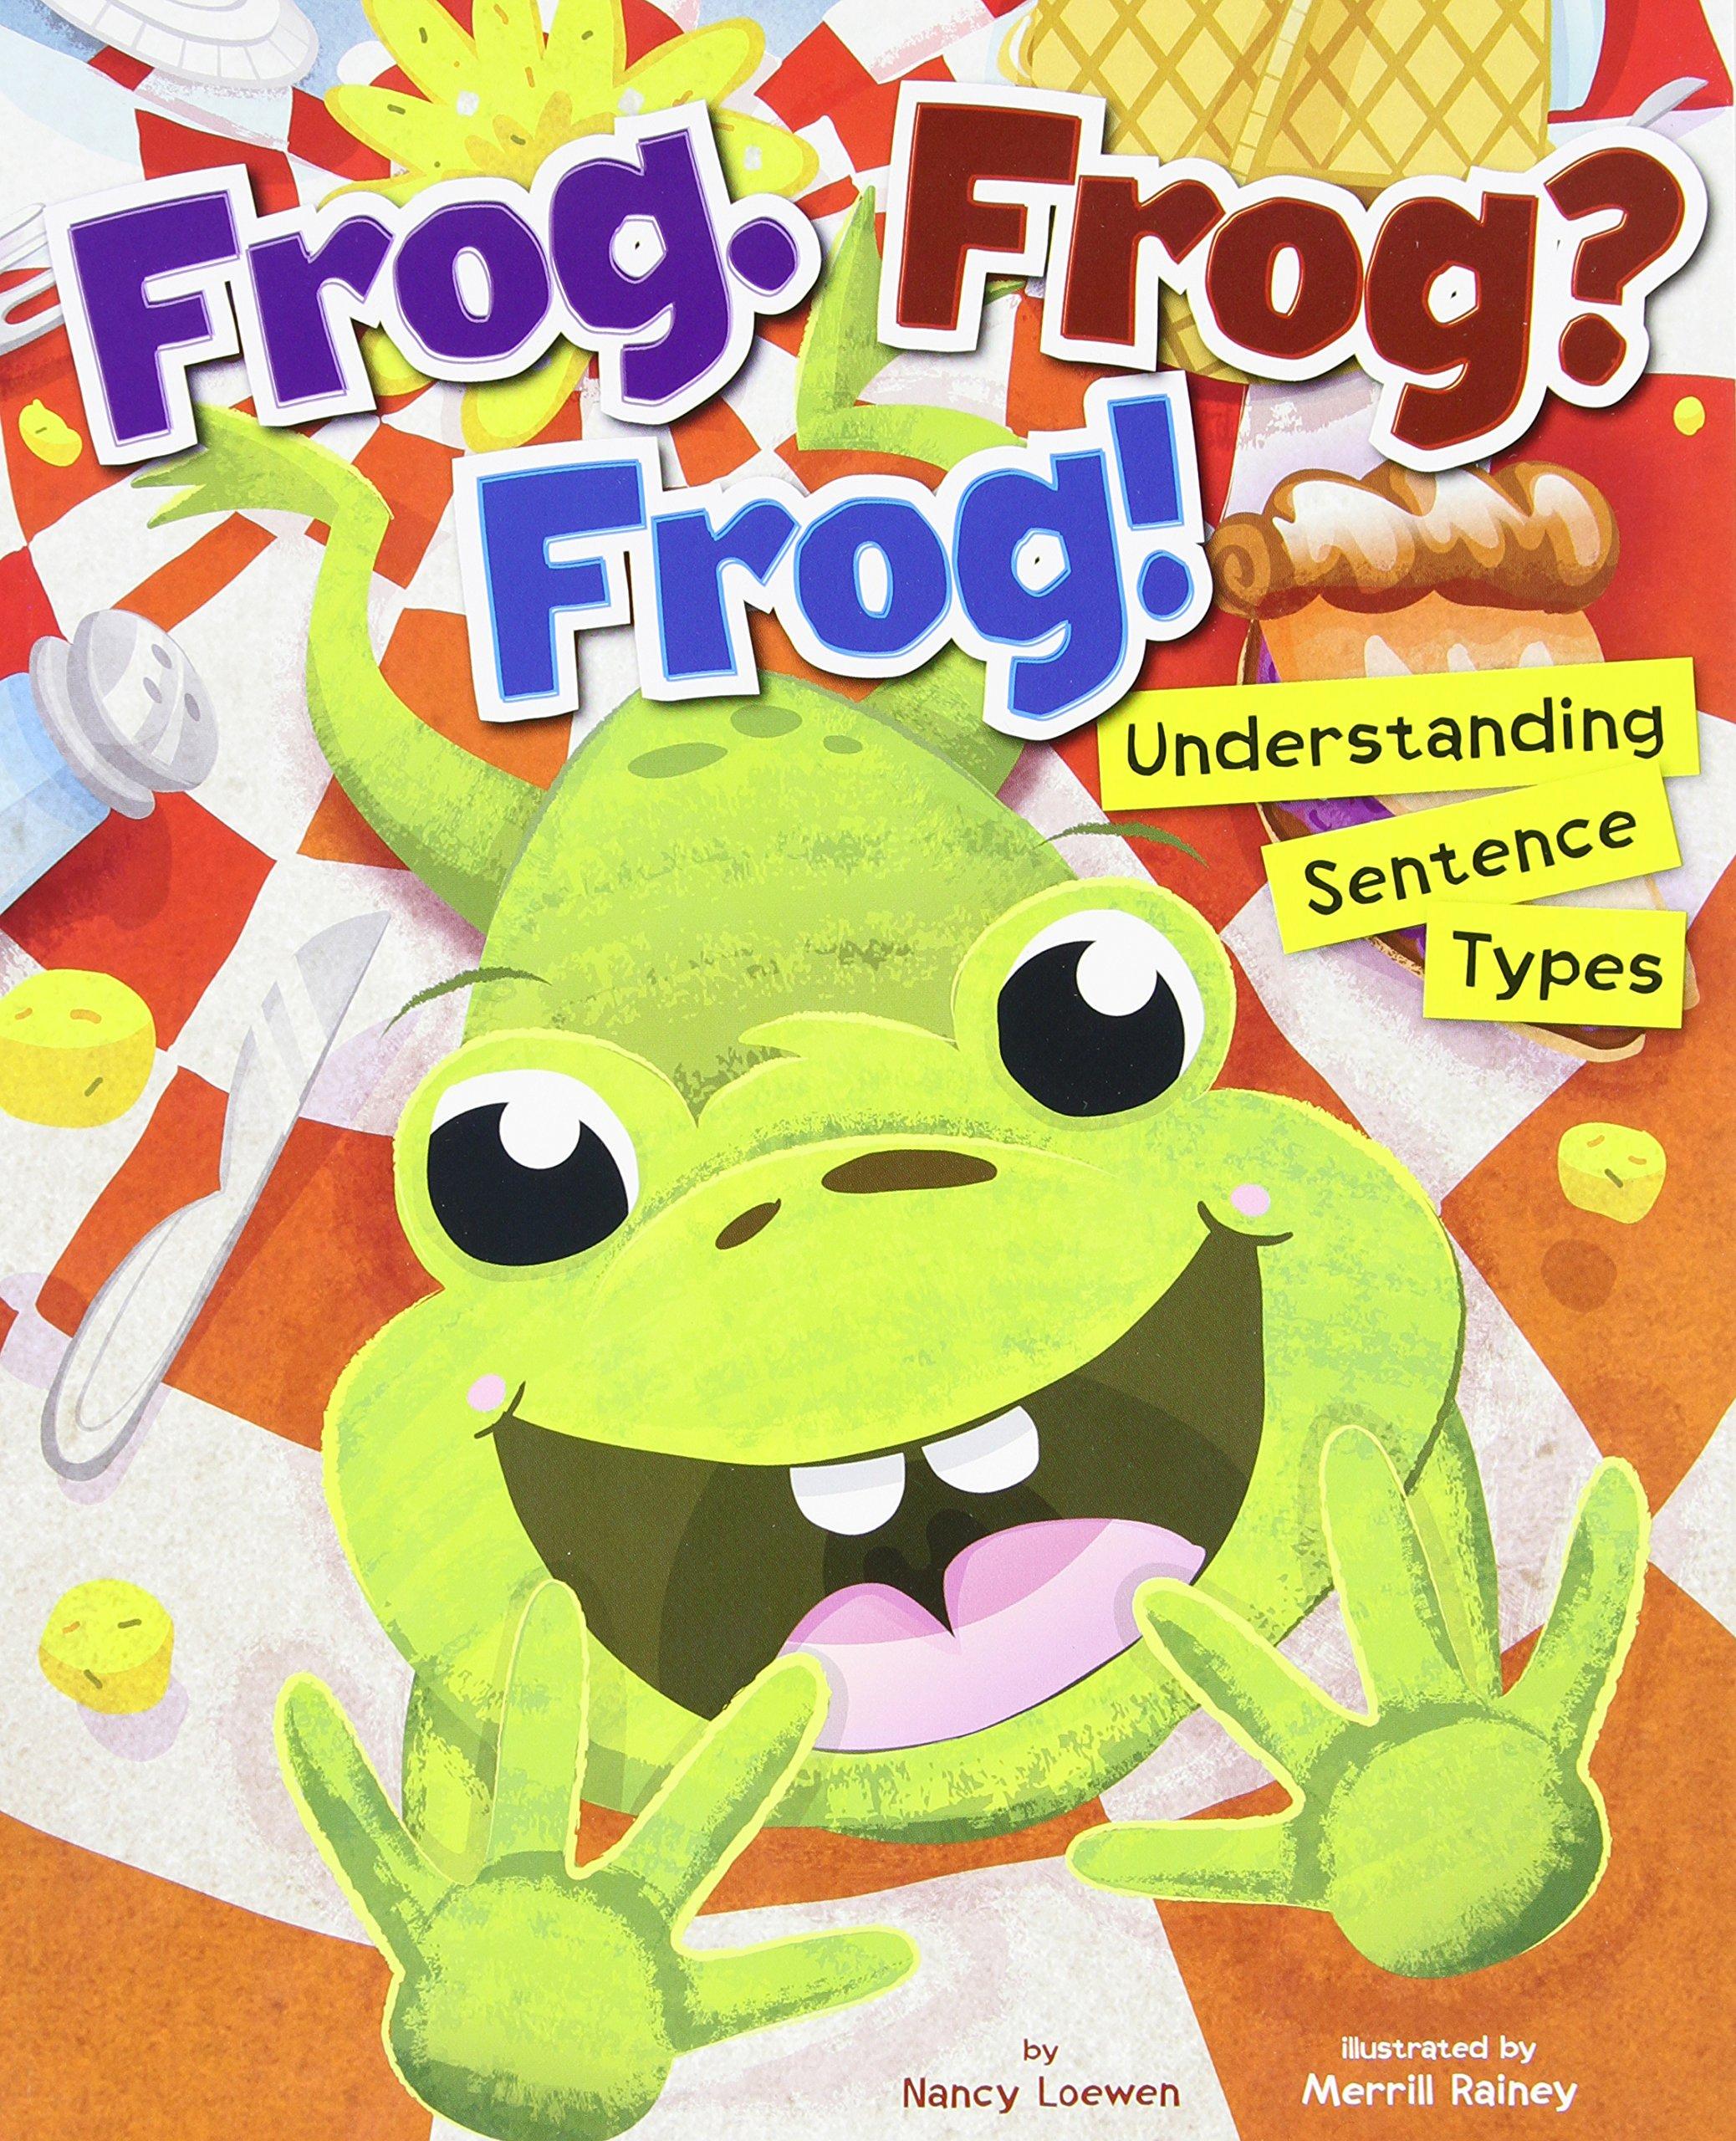 Download Frog. Frog? Frog!: Understanding Sentence Types (Language on the Loose) ebook